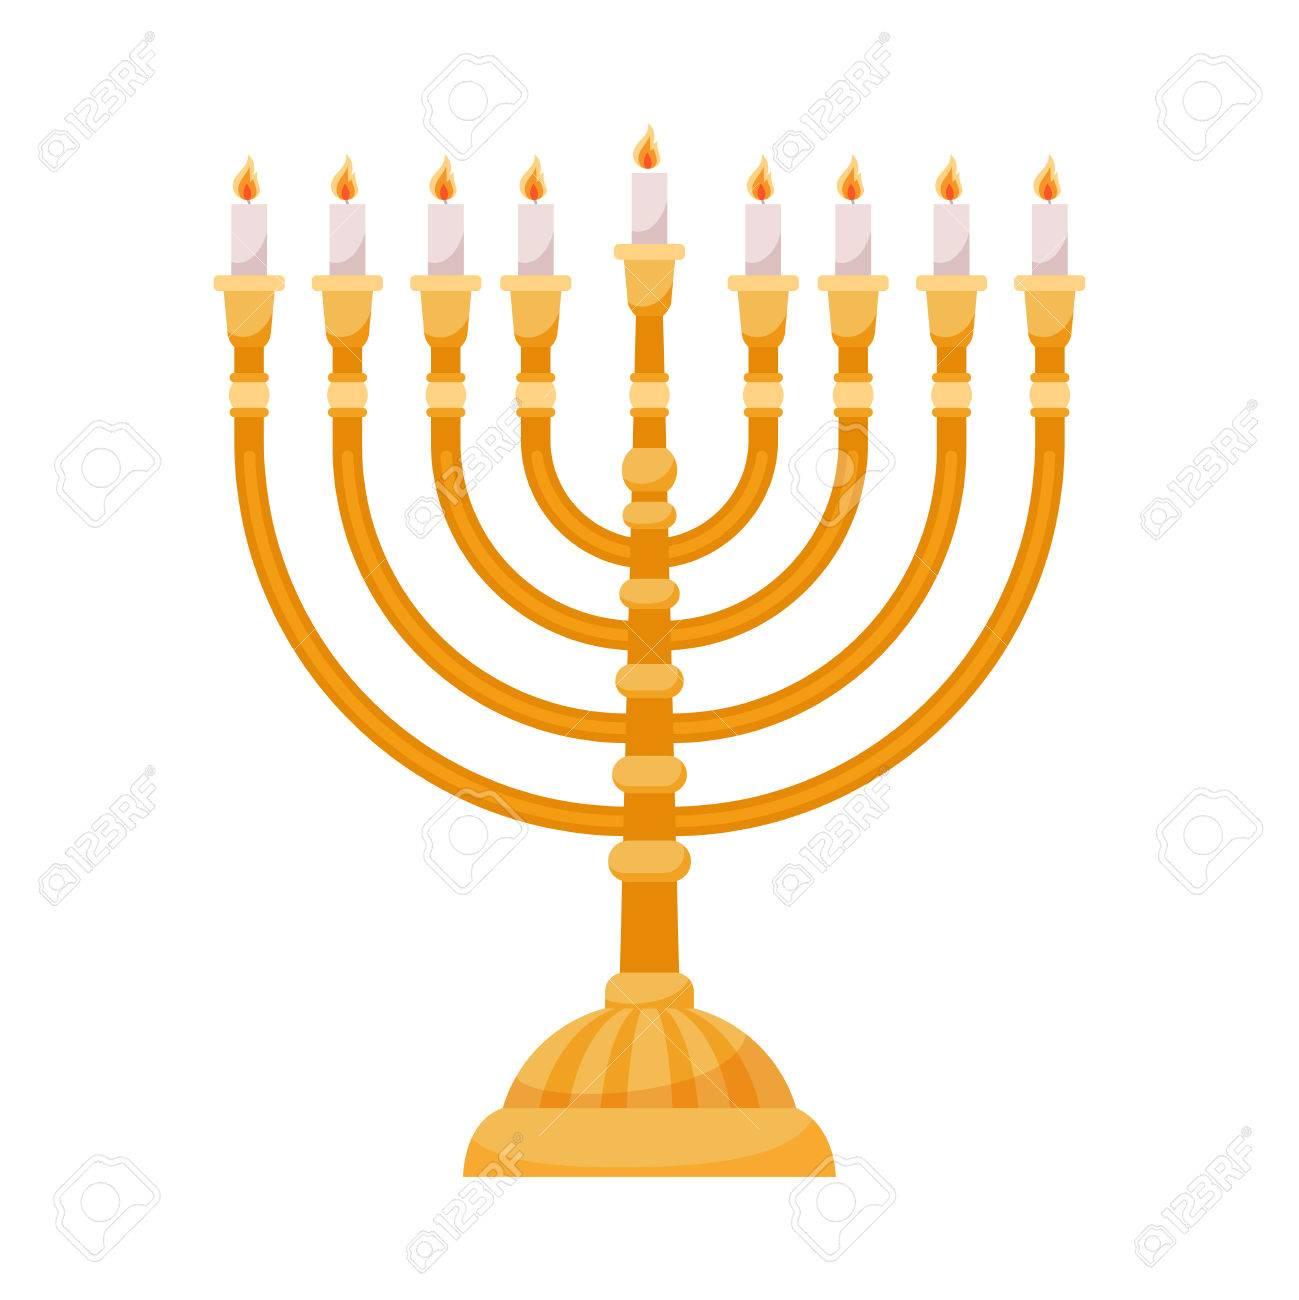 Ben Hanuka | Law Works P.C | ZoomInfo.com